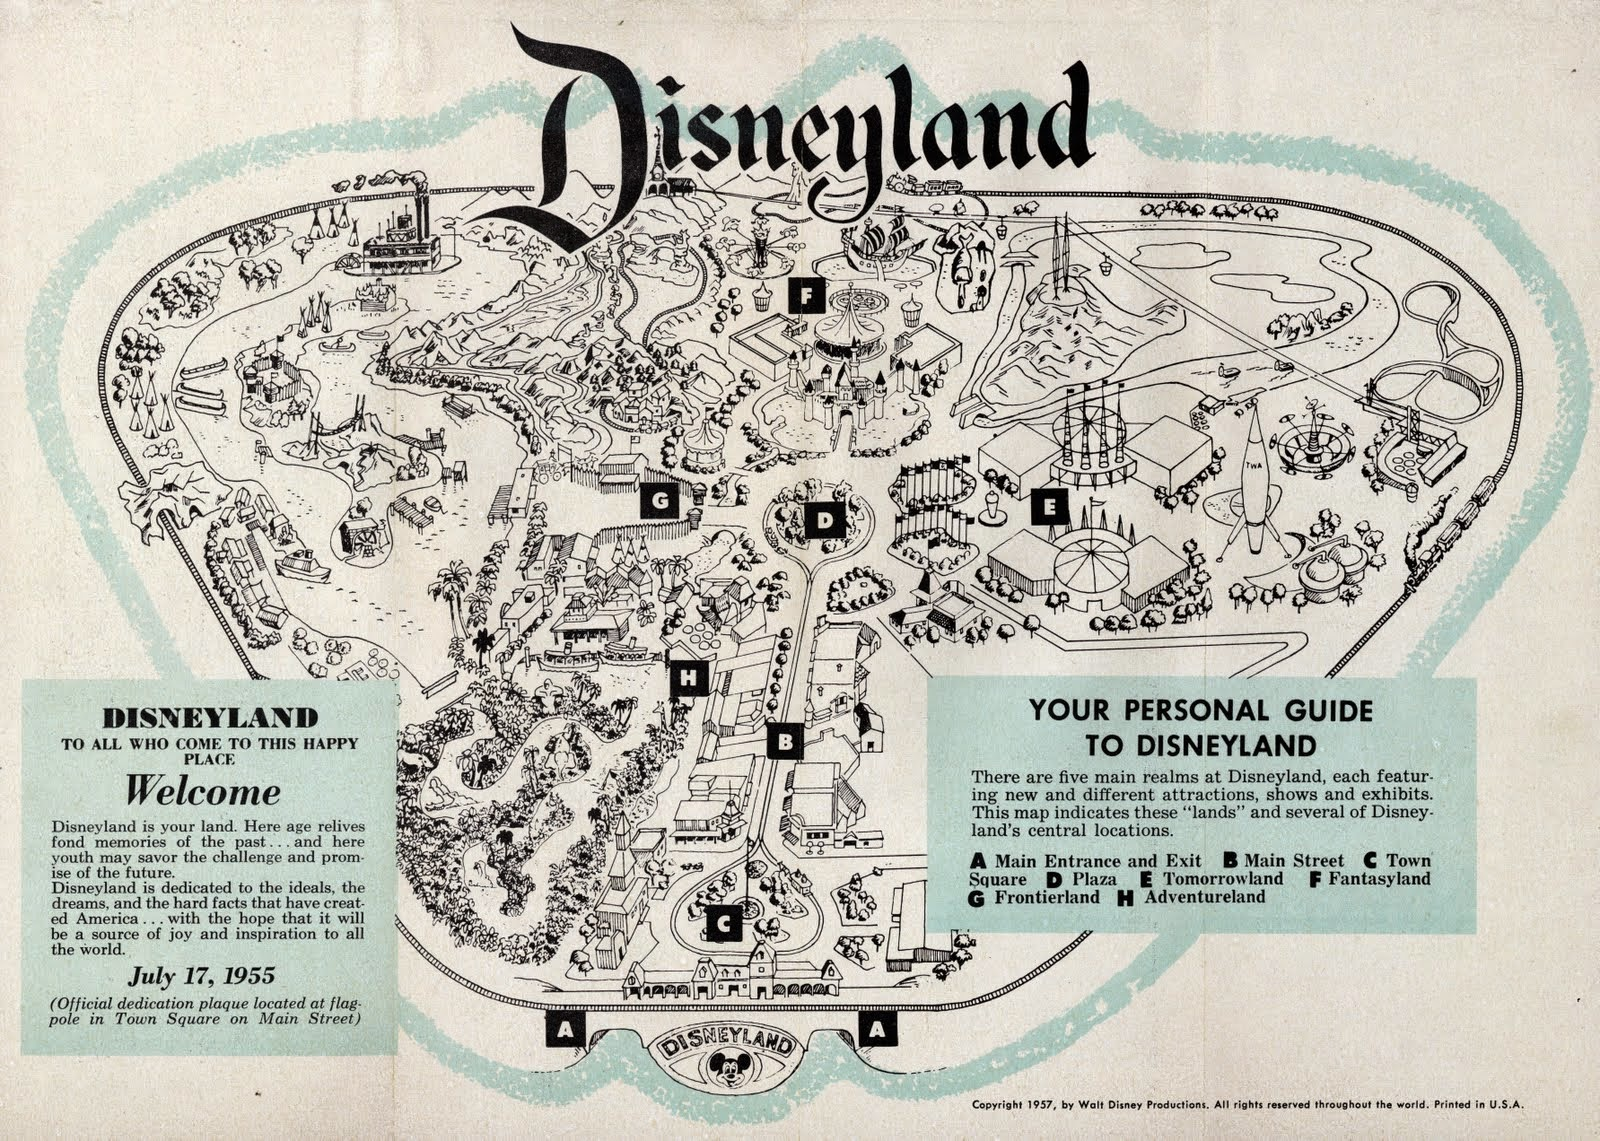 Disney Avenue Disneyland Map Evolution - 18 amazing rare colour photos disneyland 1955